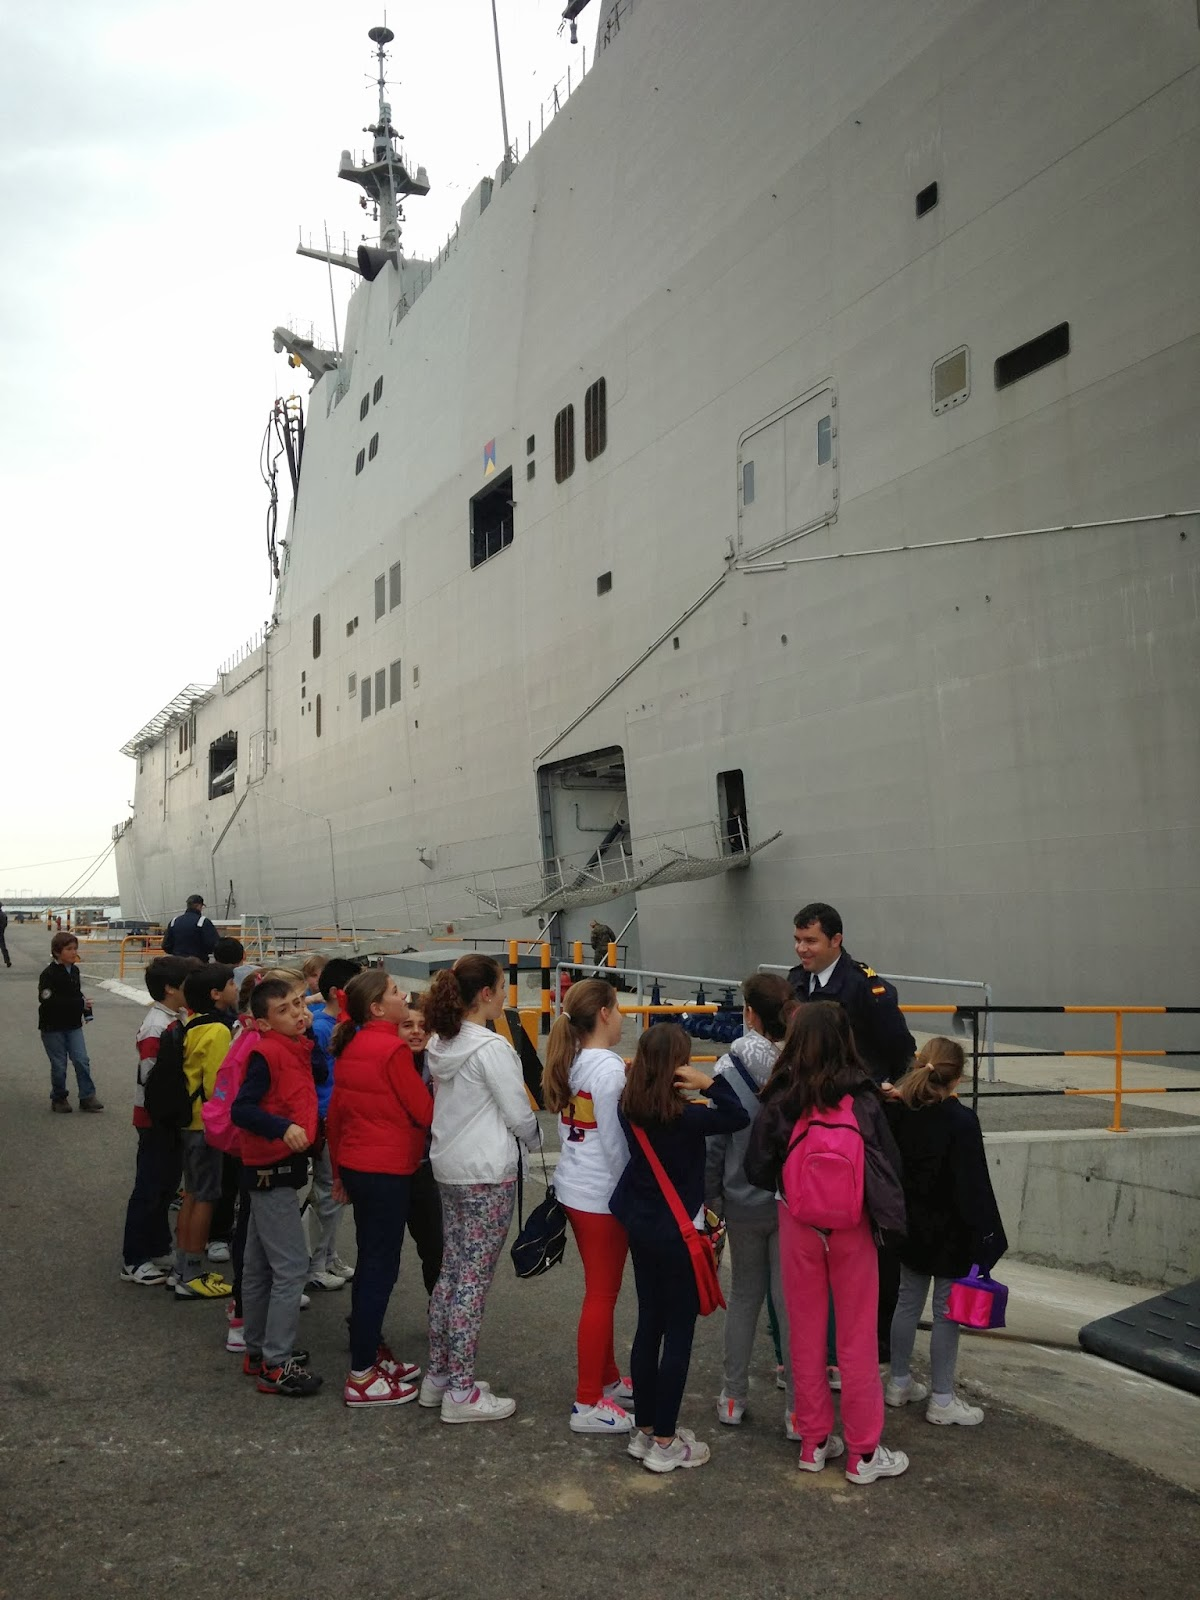 Amphibious Pelicula el blog de 3º y 4º: los alumnos de 4º visitan el buque juan